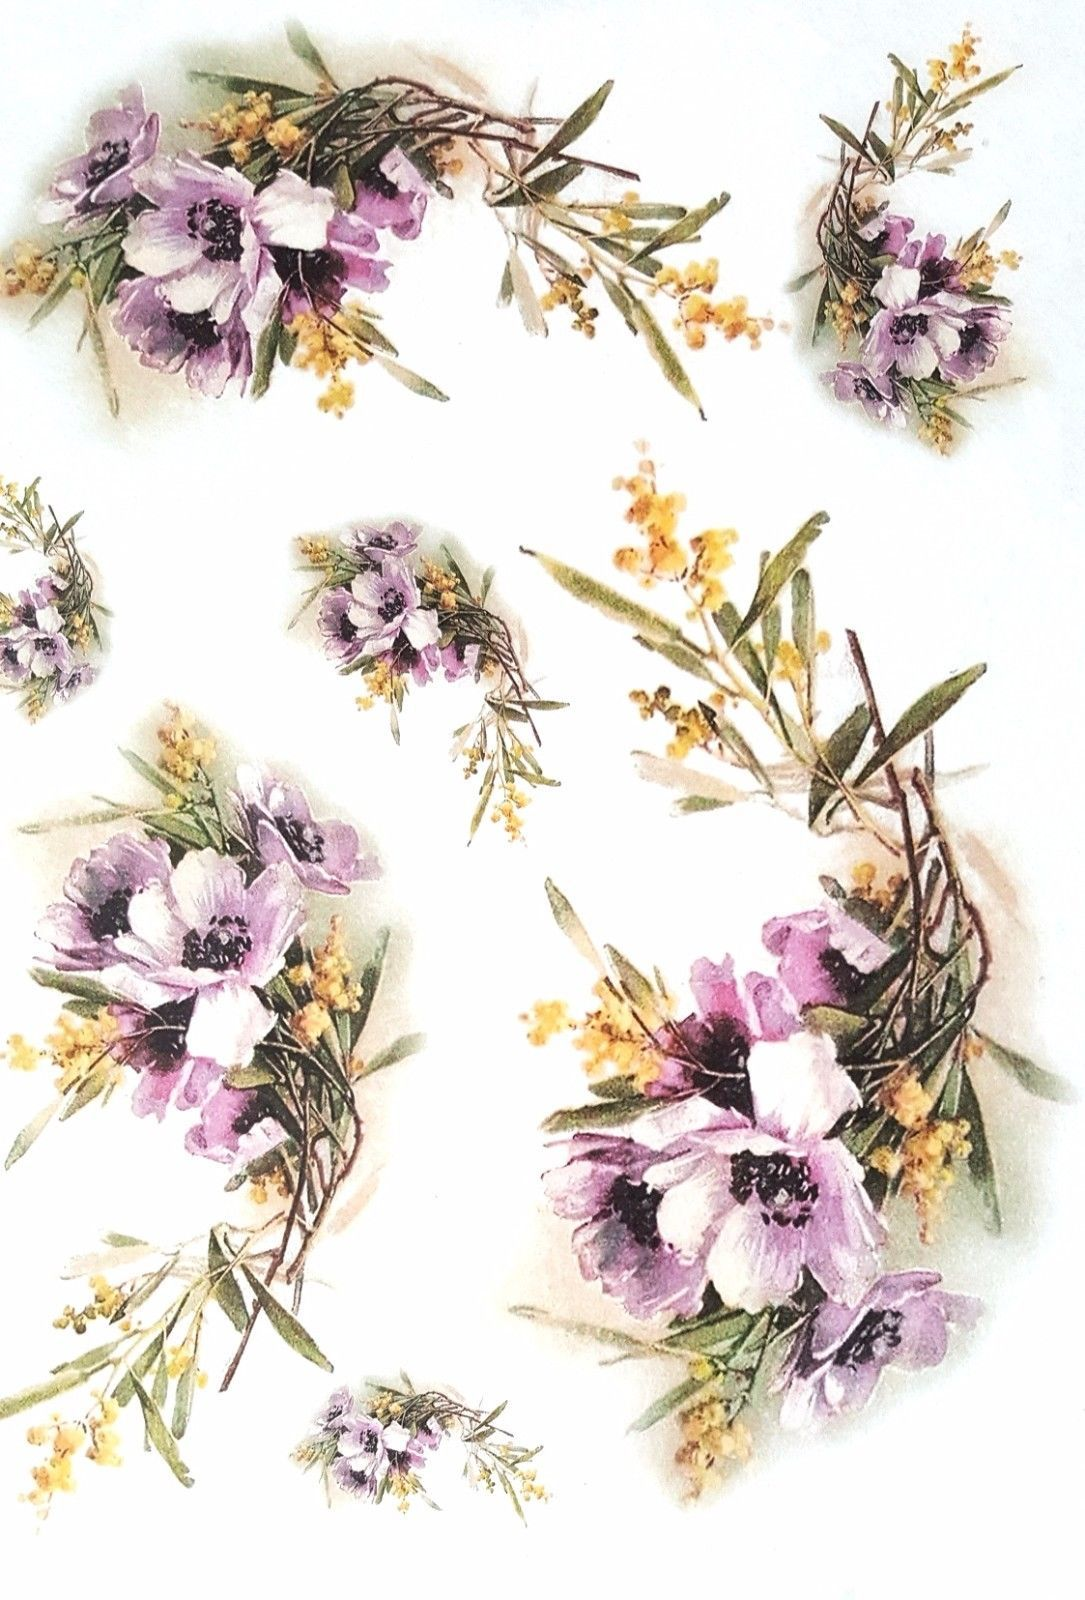 Rice Paper For Decoupage Scrapbooking Sheet Craft Vintage Garden Flowers 1 2